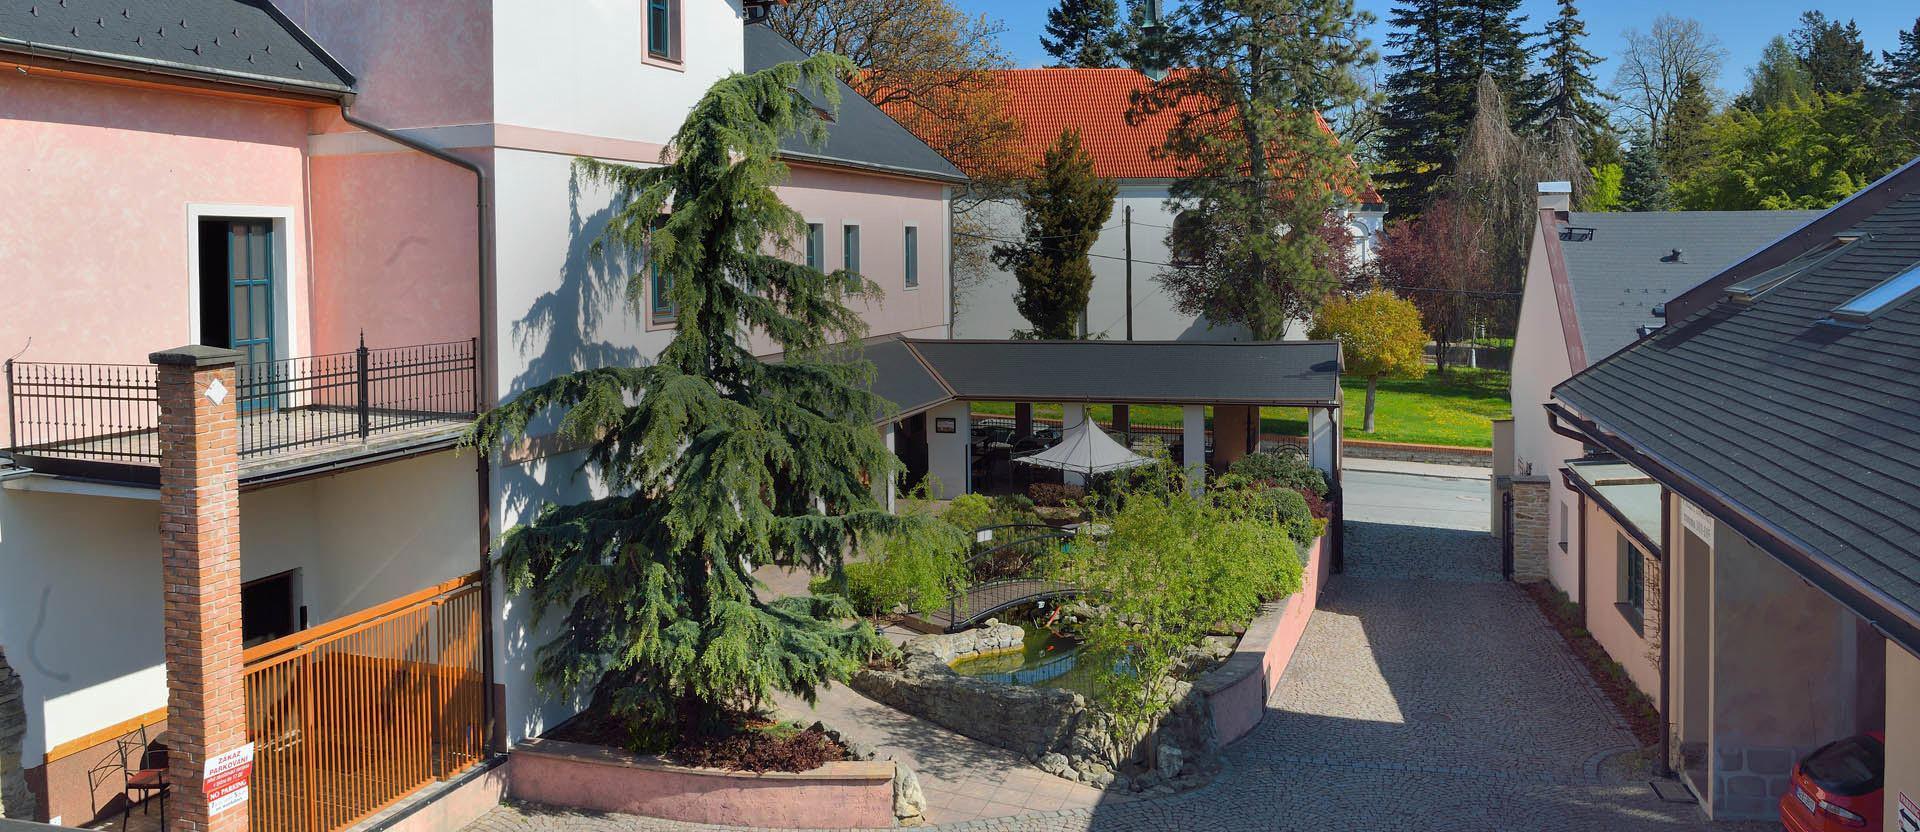 794f55c3f Hotel and restaurant Via Ironia Vysoké Mýto